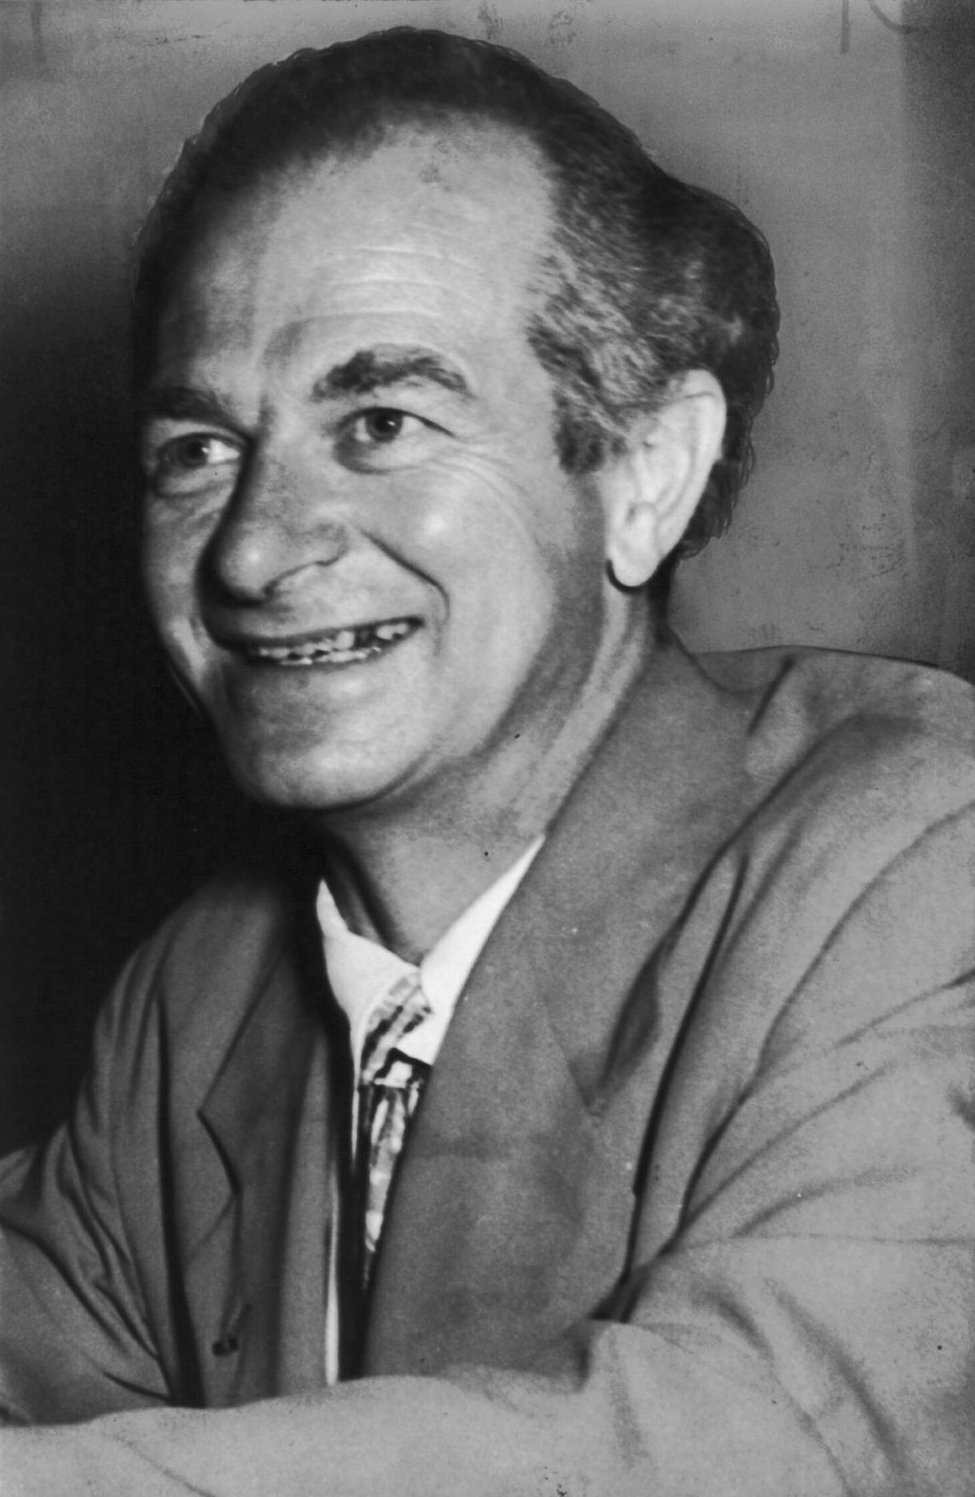 Depiction of Linus Pauling